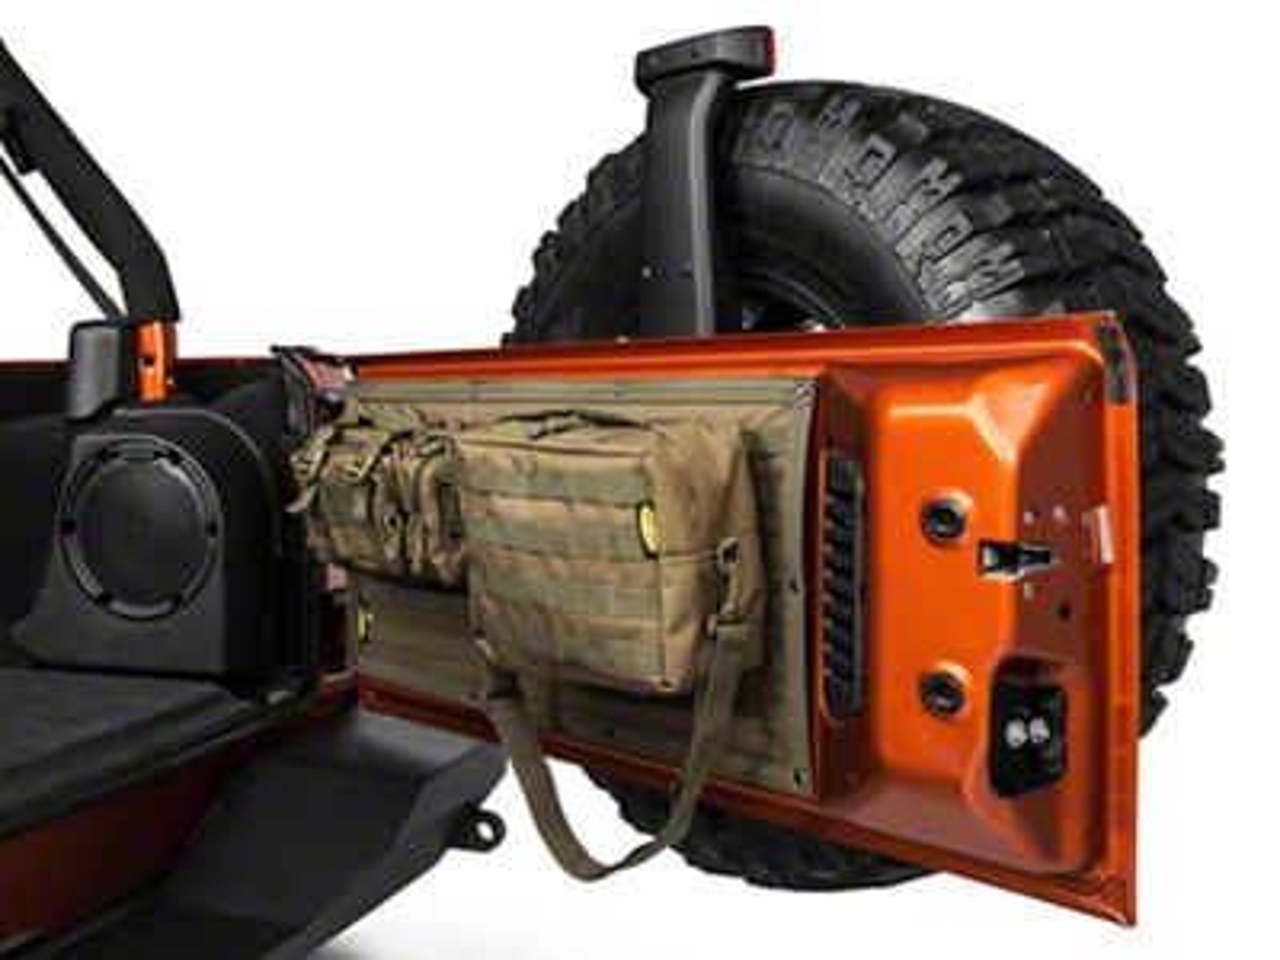 Smittybilt GEAR Tailgate Cover - O.D. Green (07-18 Jeep Wrangler JK)